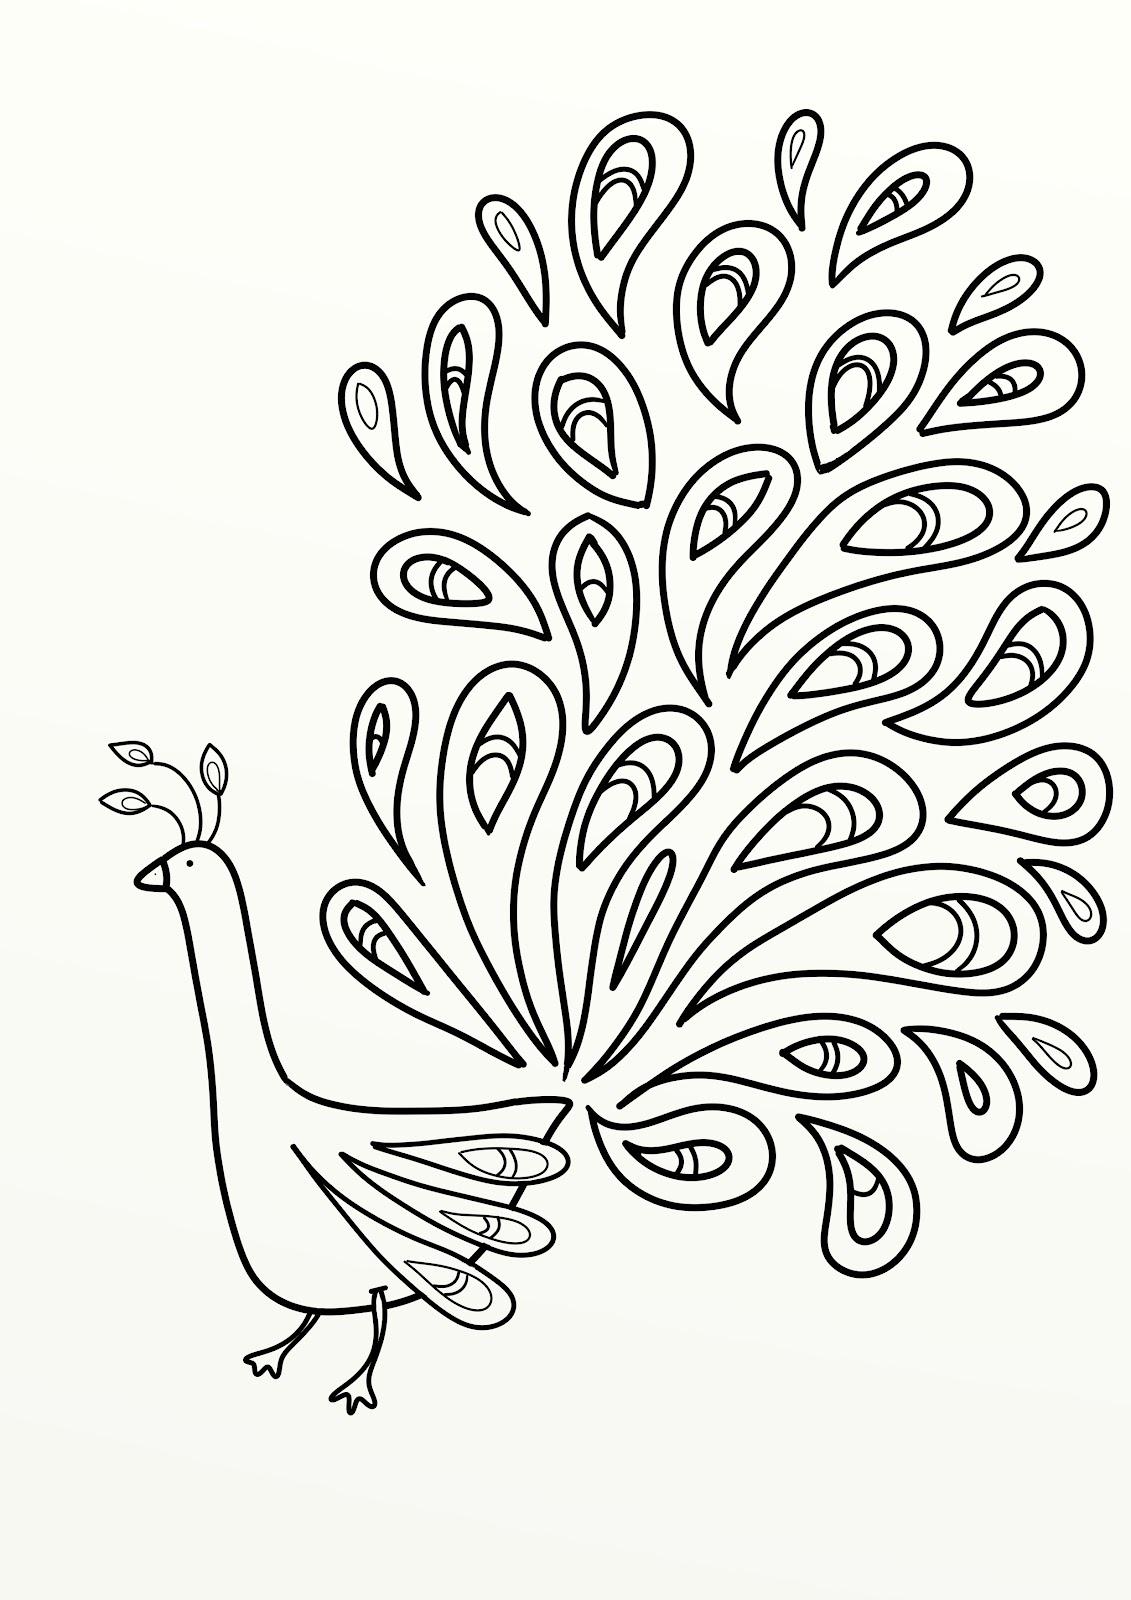 Peacock body outline - photo#21